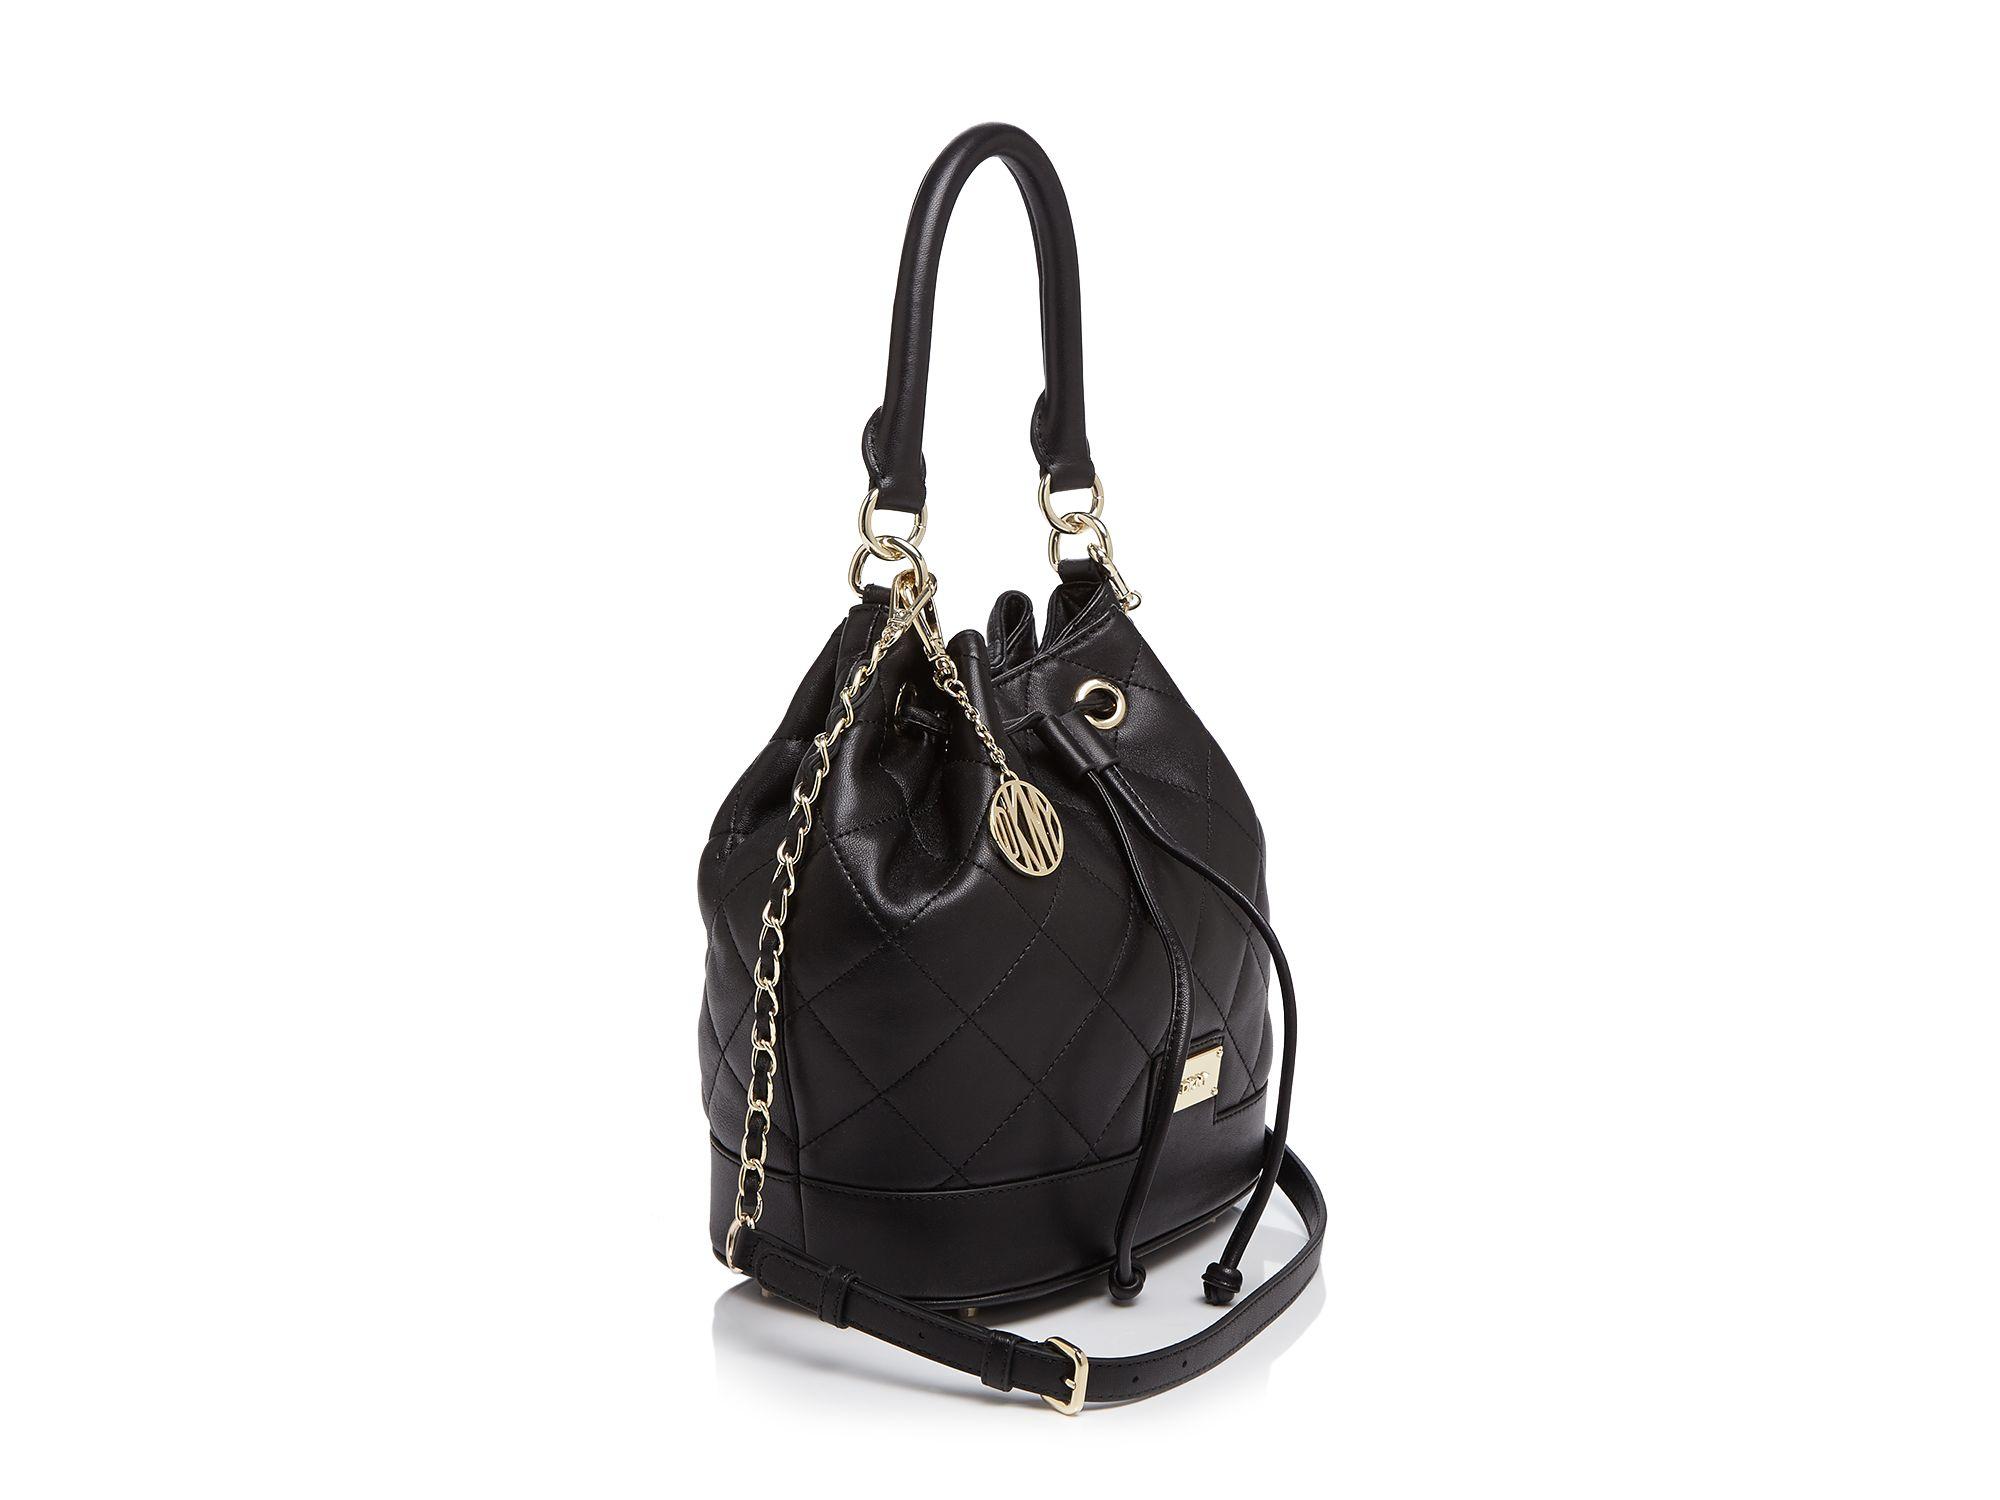 Dkny Shoulder Bag - Quilted Nappa Drawstring Bucket in Black | Lyst : dkny black quilted handbag - Adamdwight.com